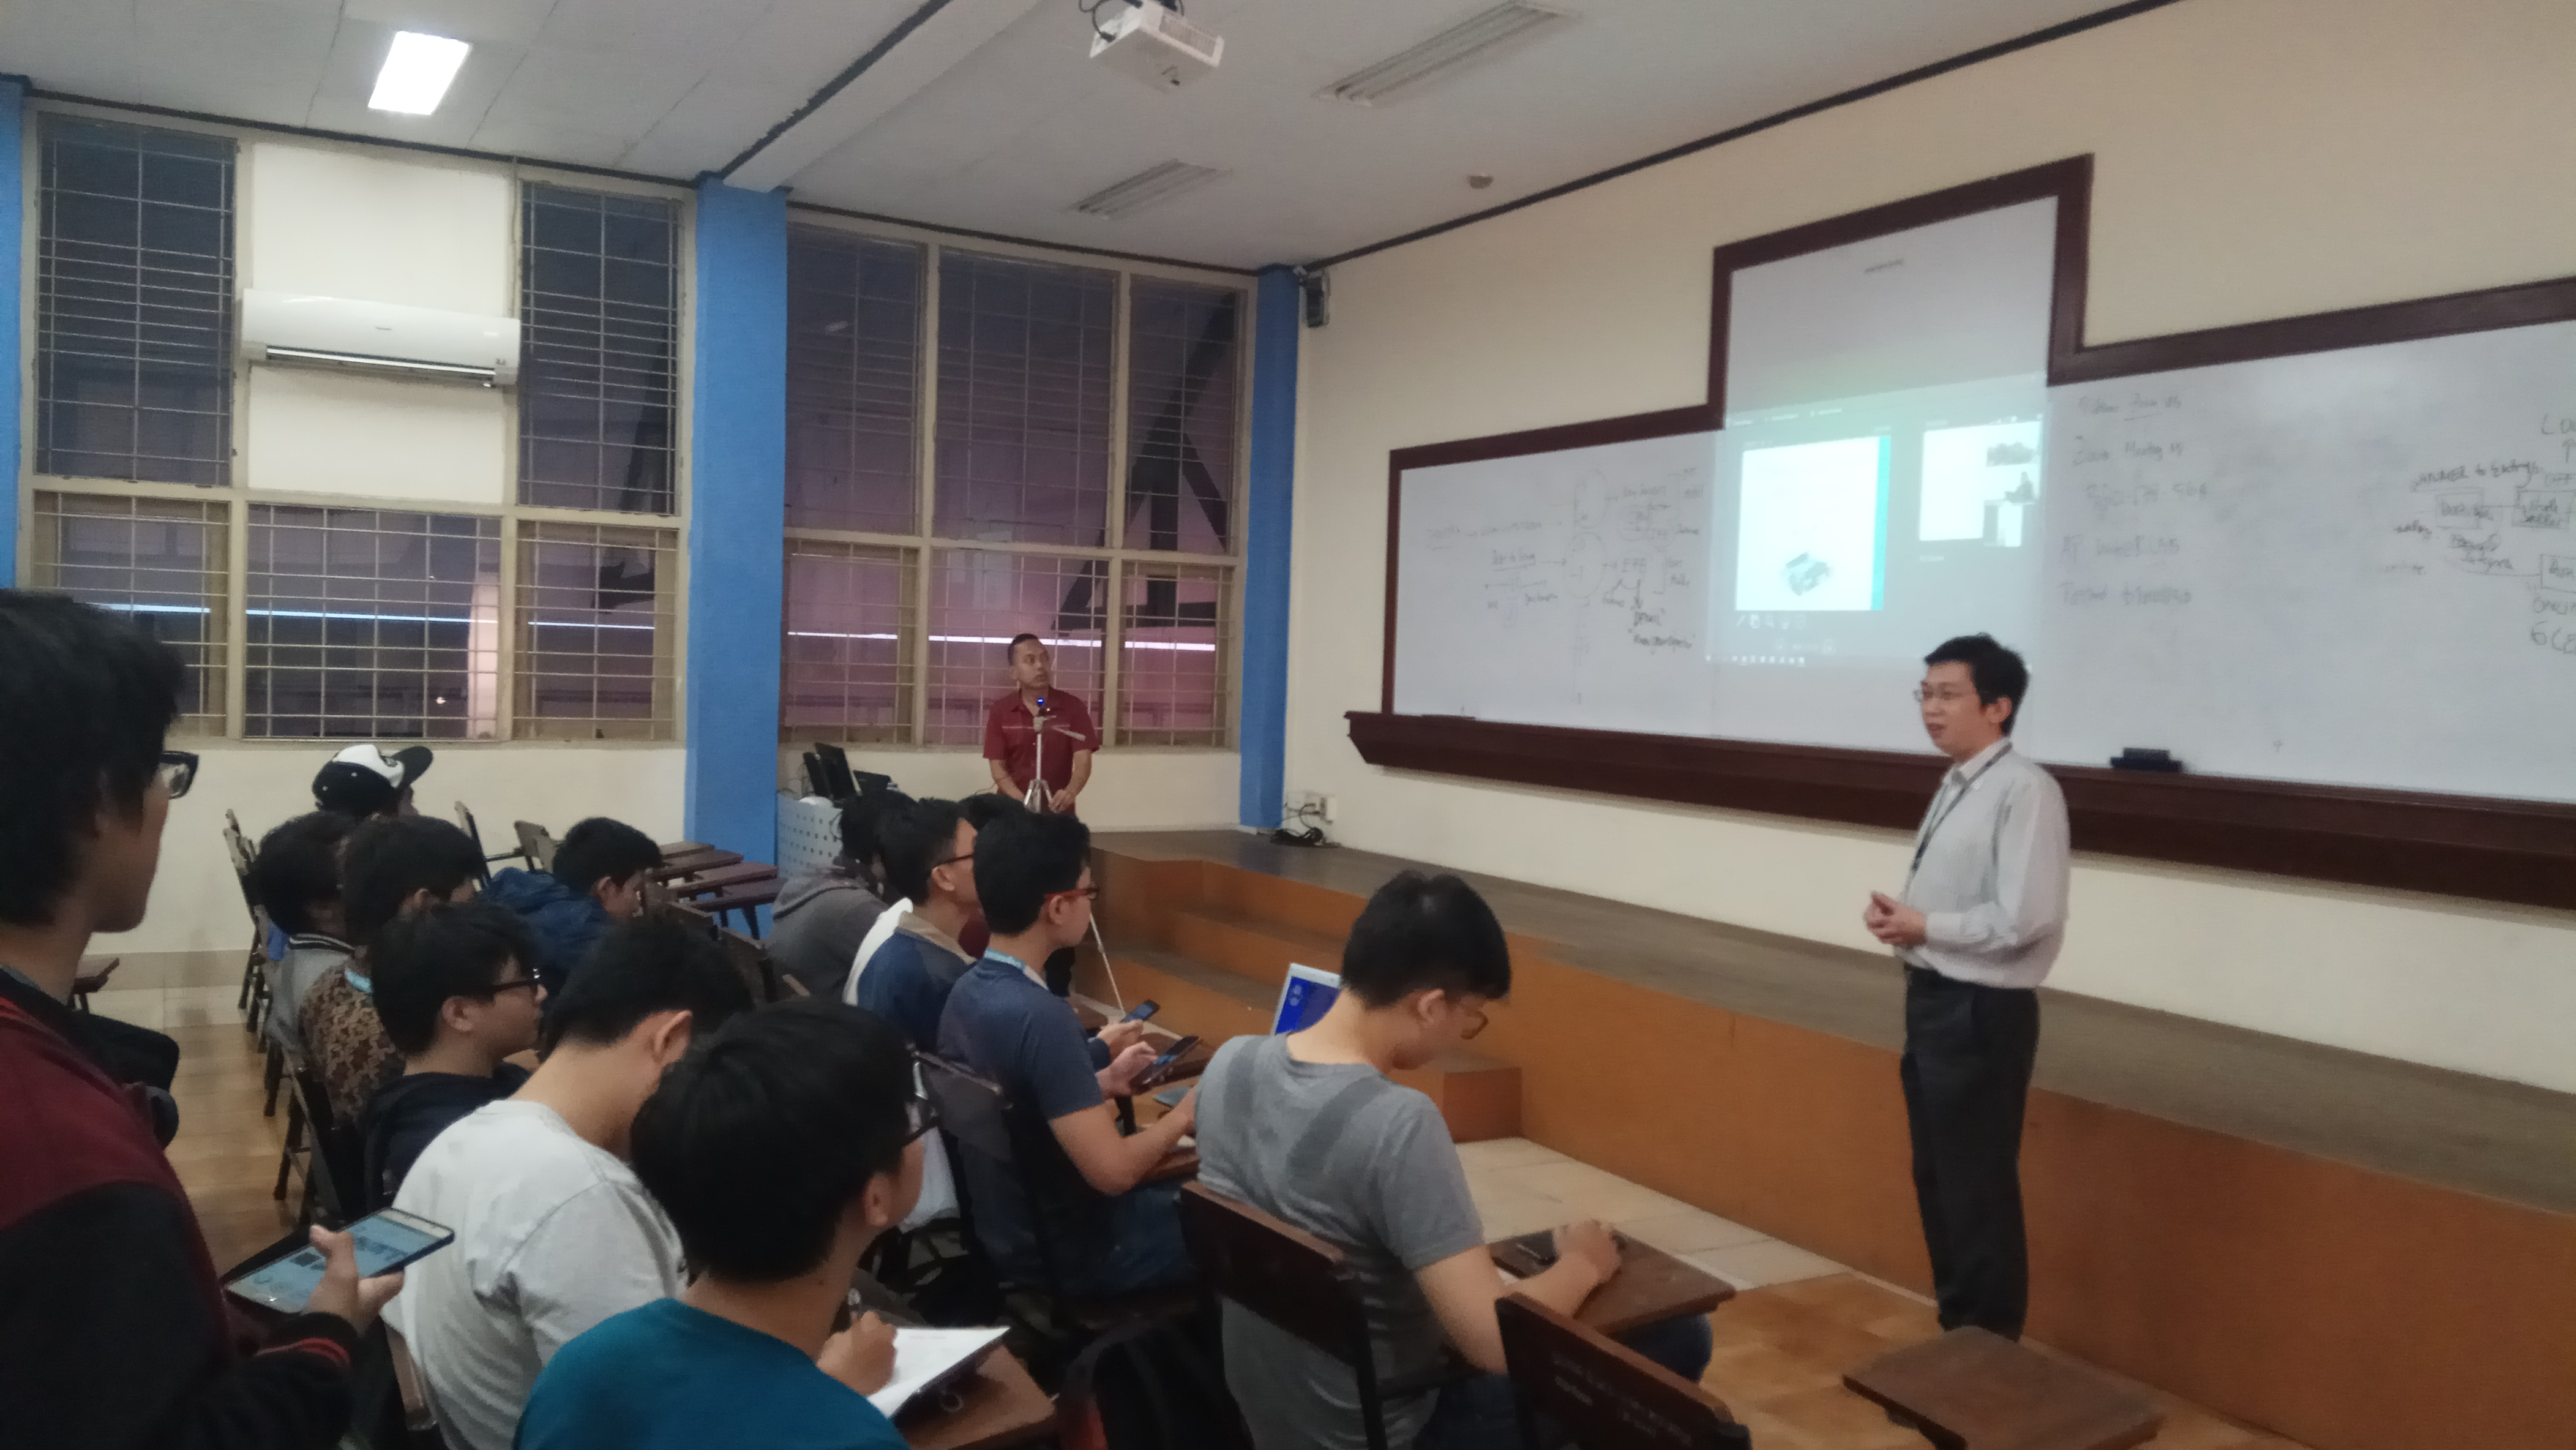 Online Video Guest Lecturer 5 April 2018 Universiti Malaysia Pahang